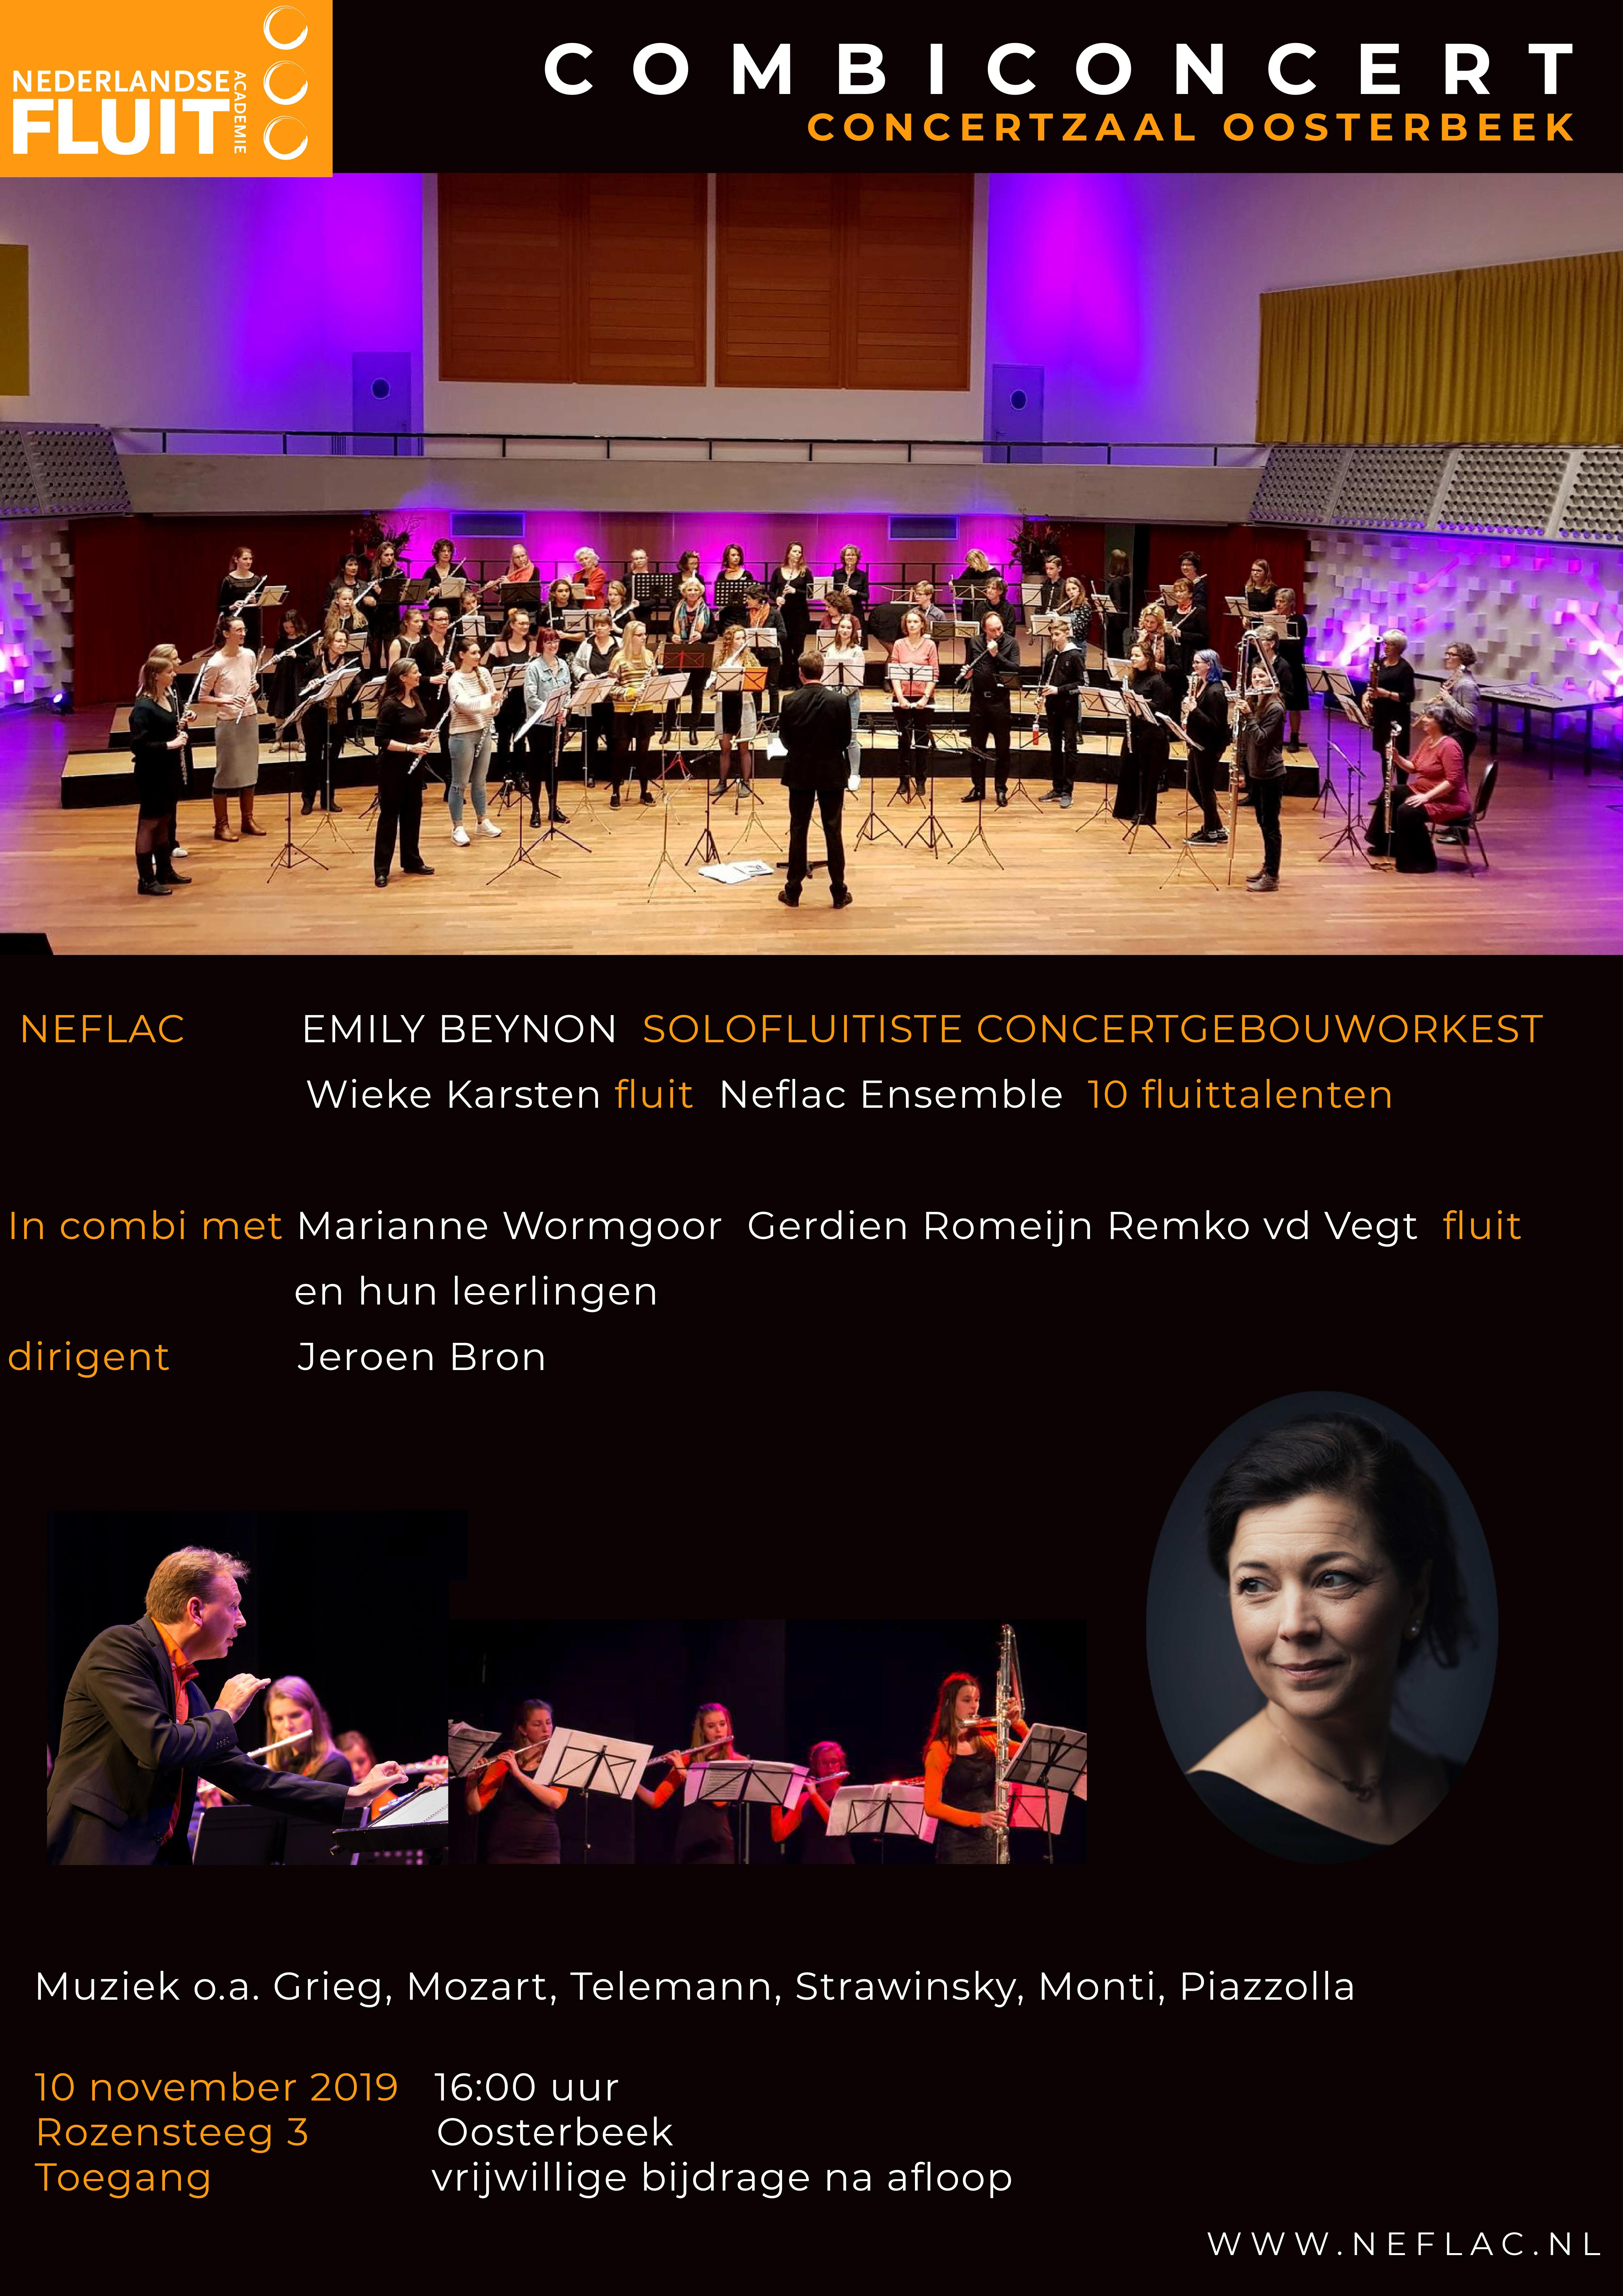 Concert Neflac CombiConcert